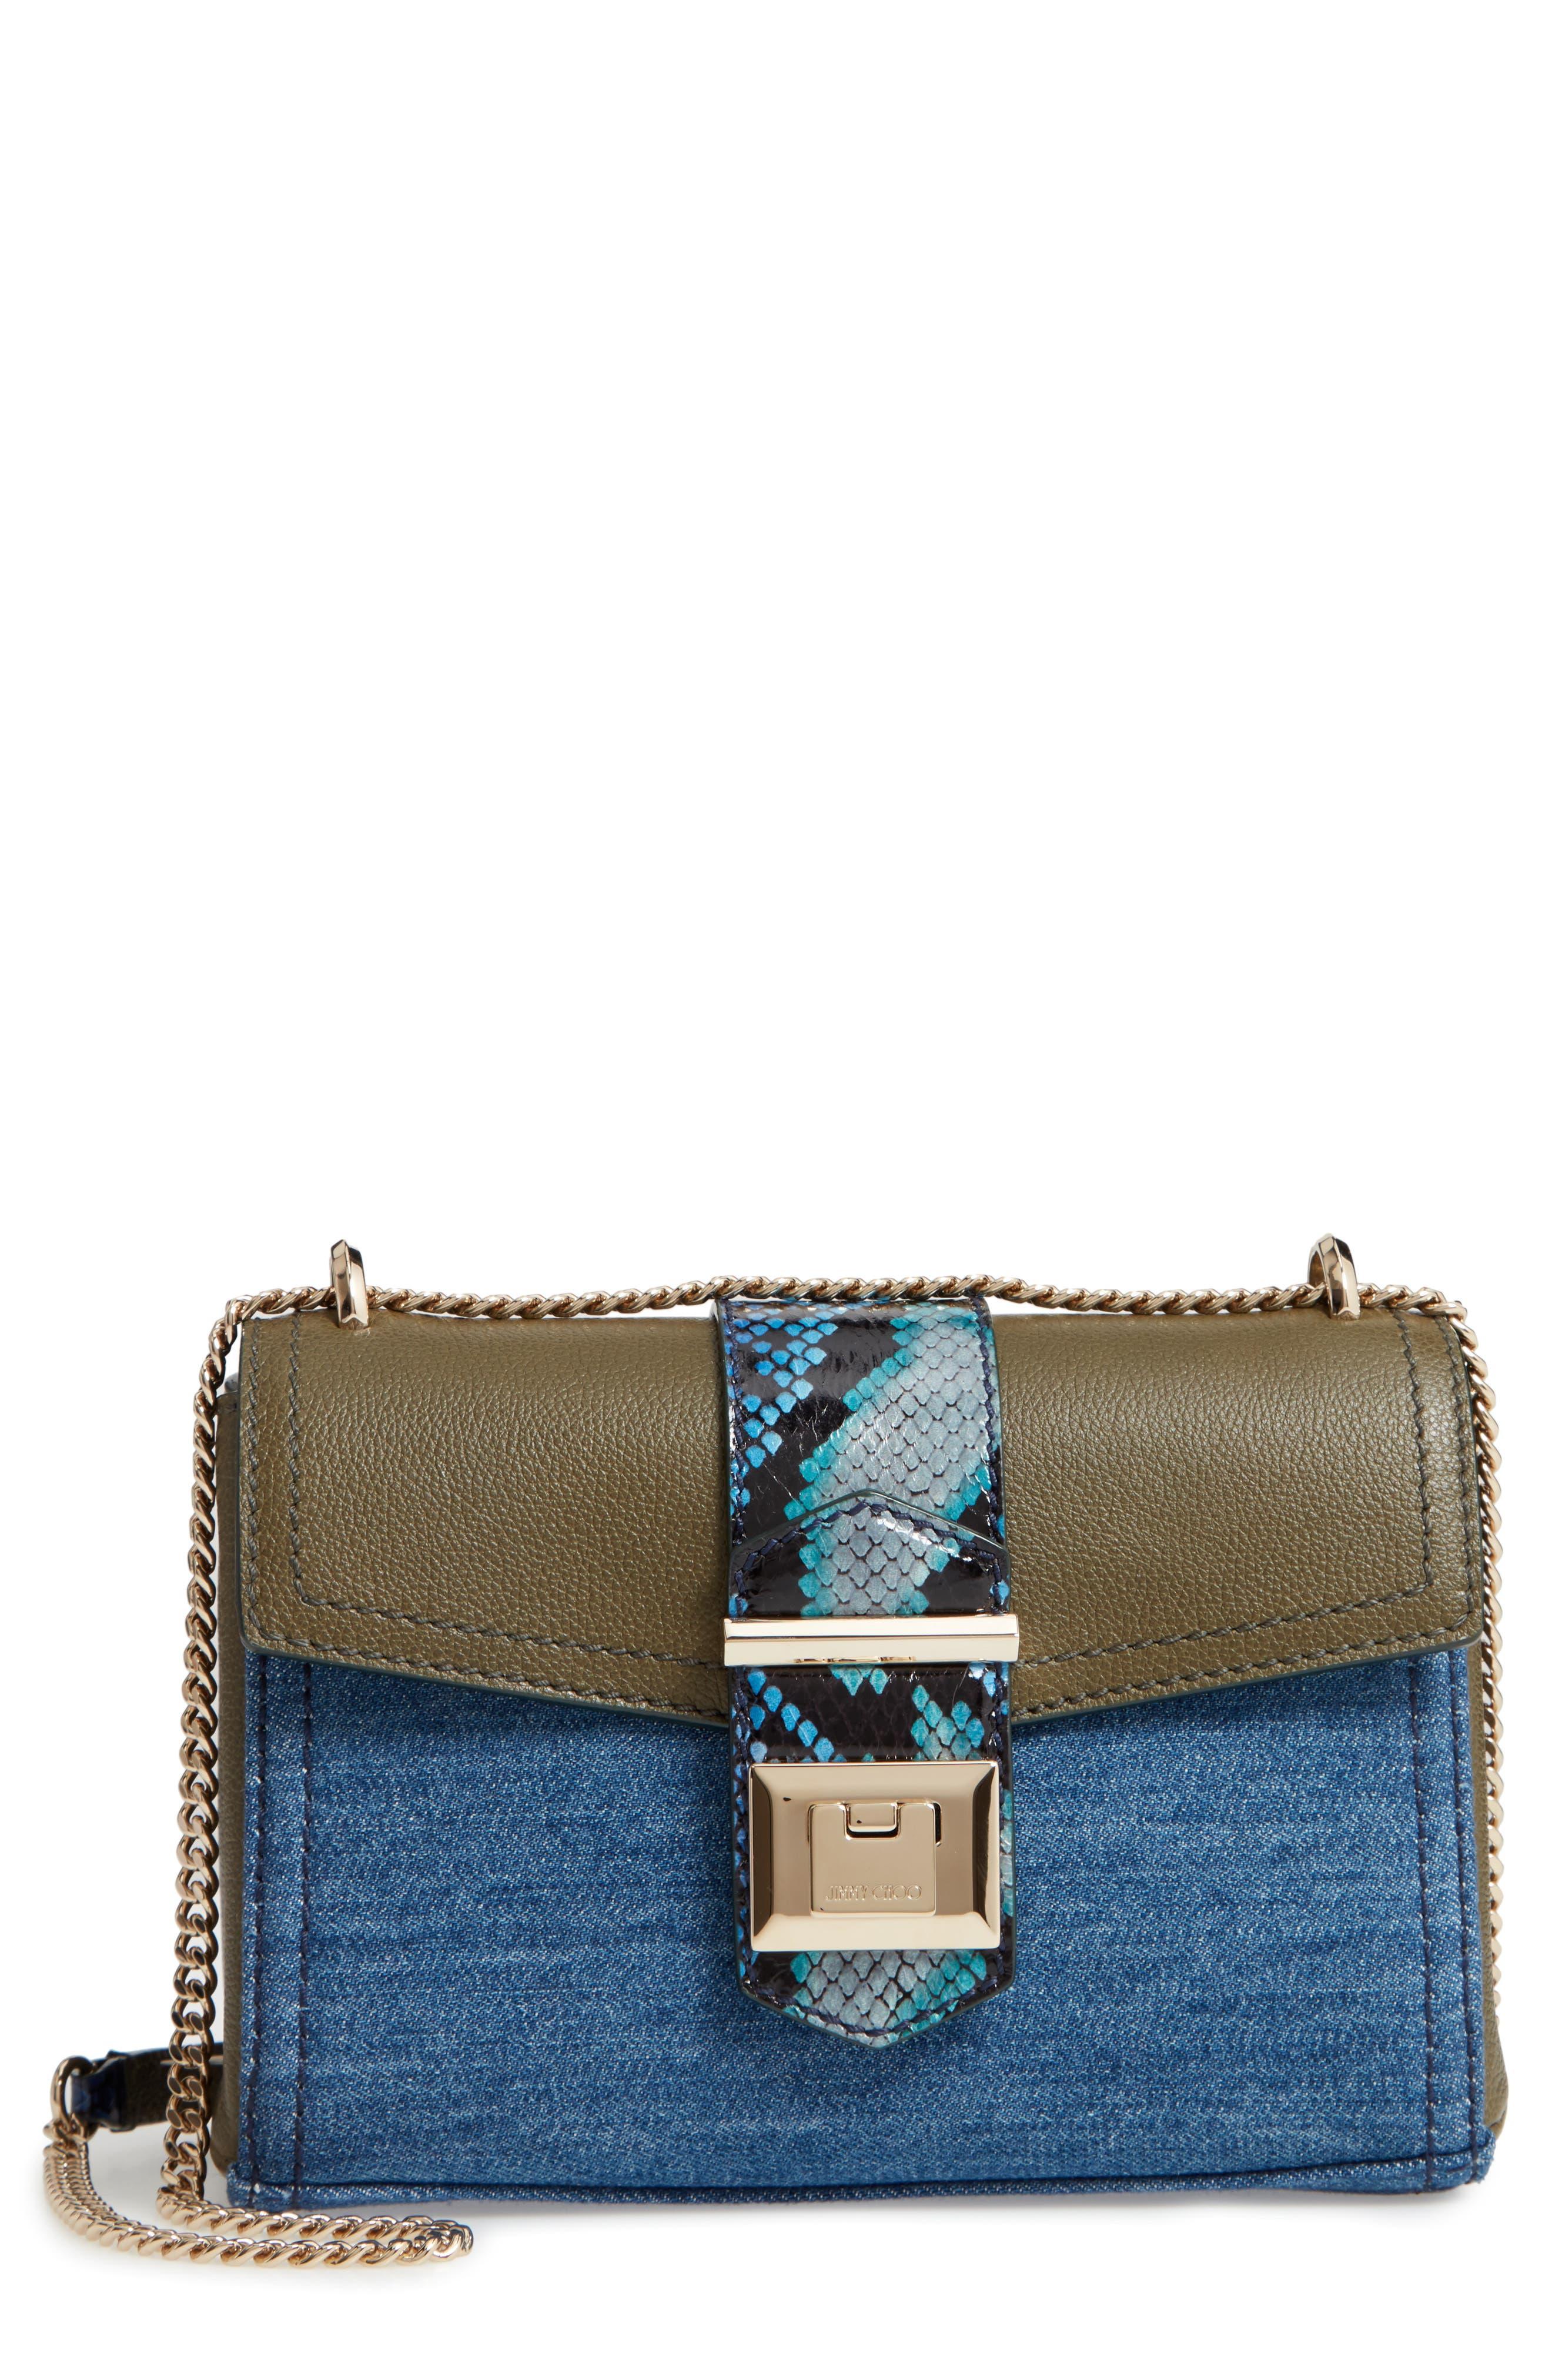 Marianne Leather & Genuine Snakeskin Crossbody Bag,                             Main thumbnail 1, color,                             NAVY MIX